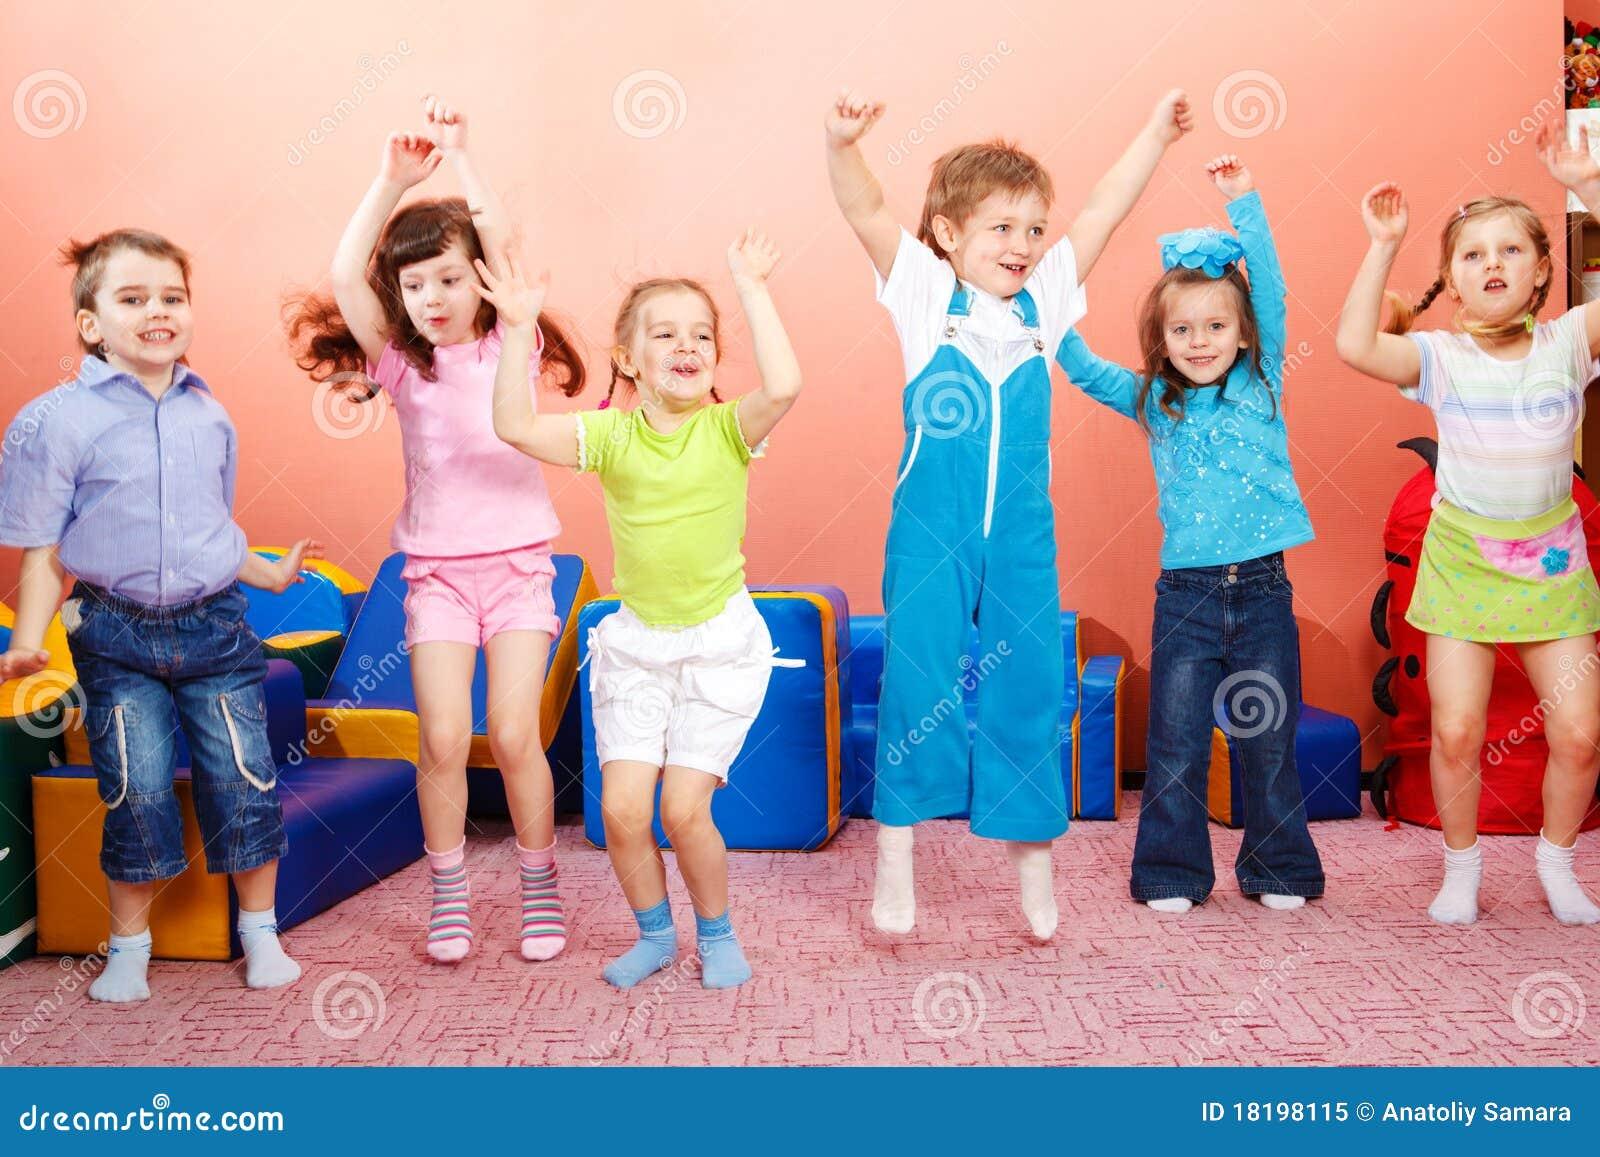 the preschool preschoolers jumping royalty free stock photo image 683